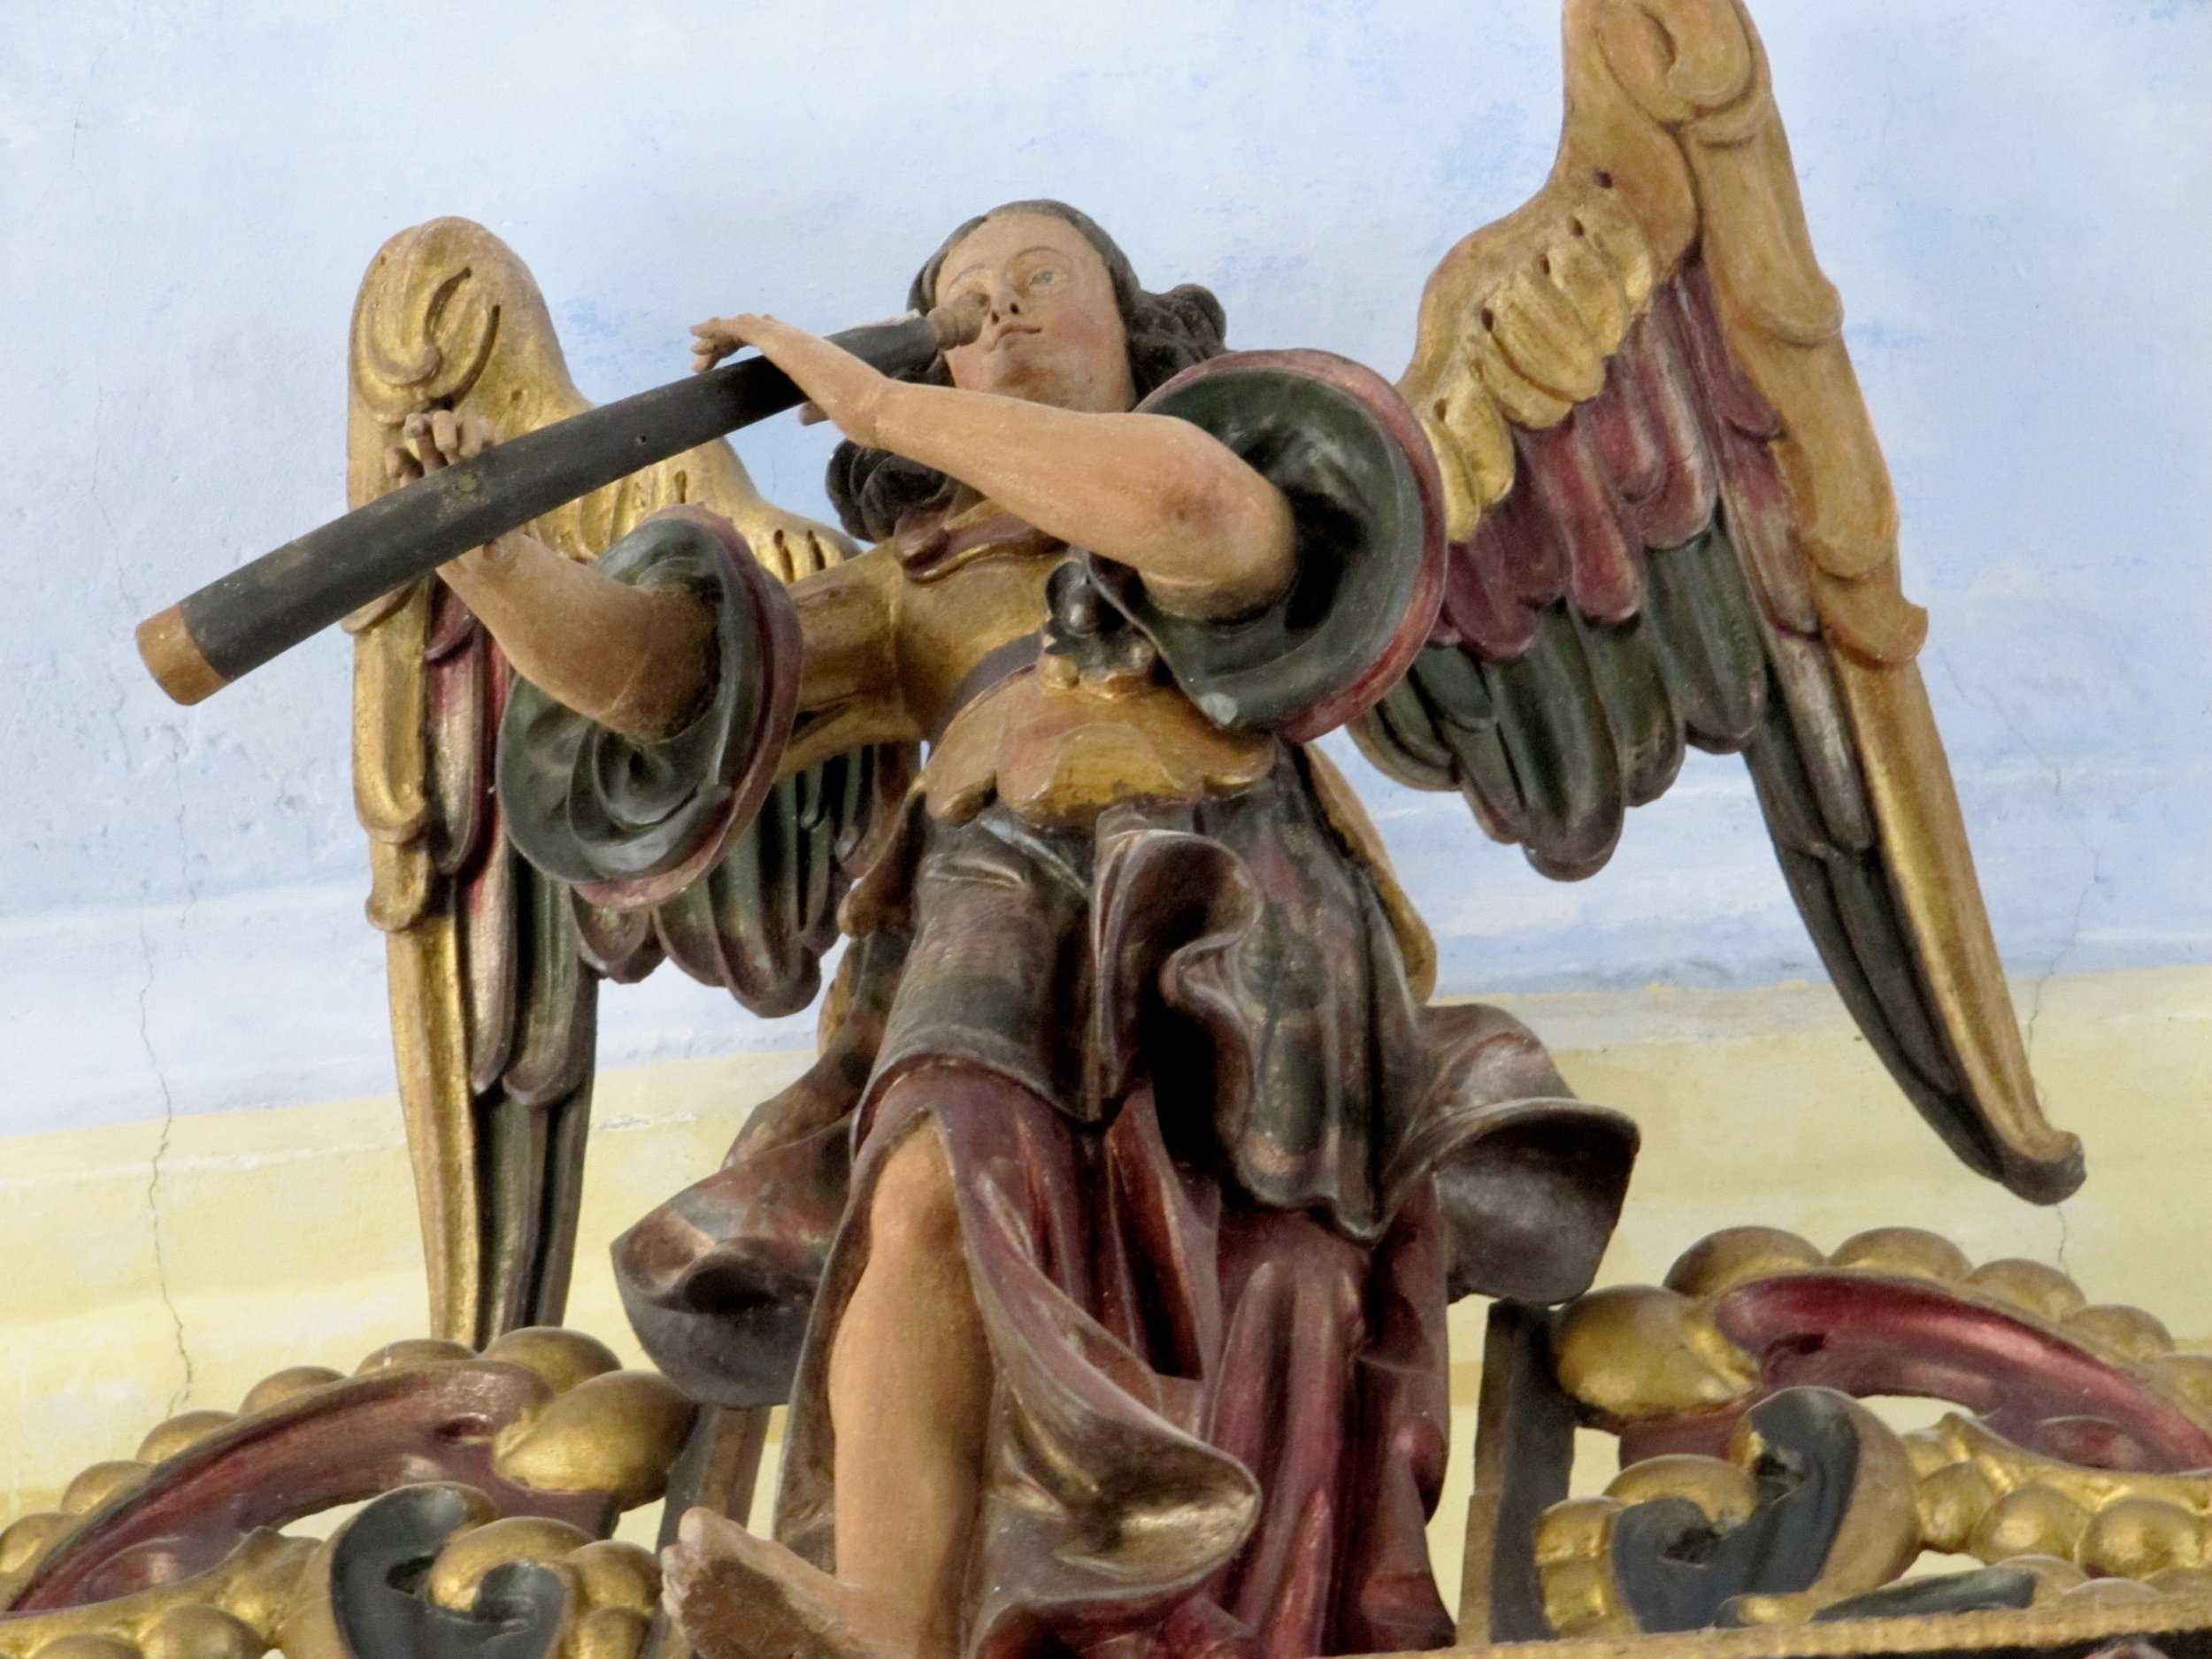 Kralovice, Czech Republic. Kostel zv. Petra a Pavla, Angel cornettist on the organ